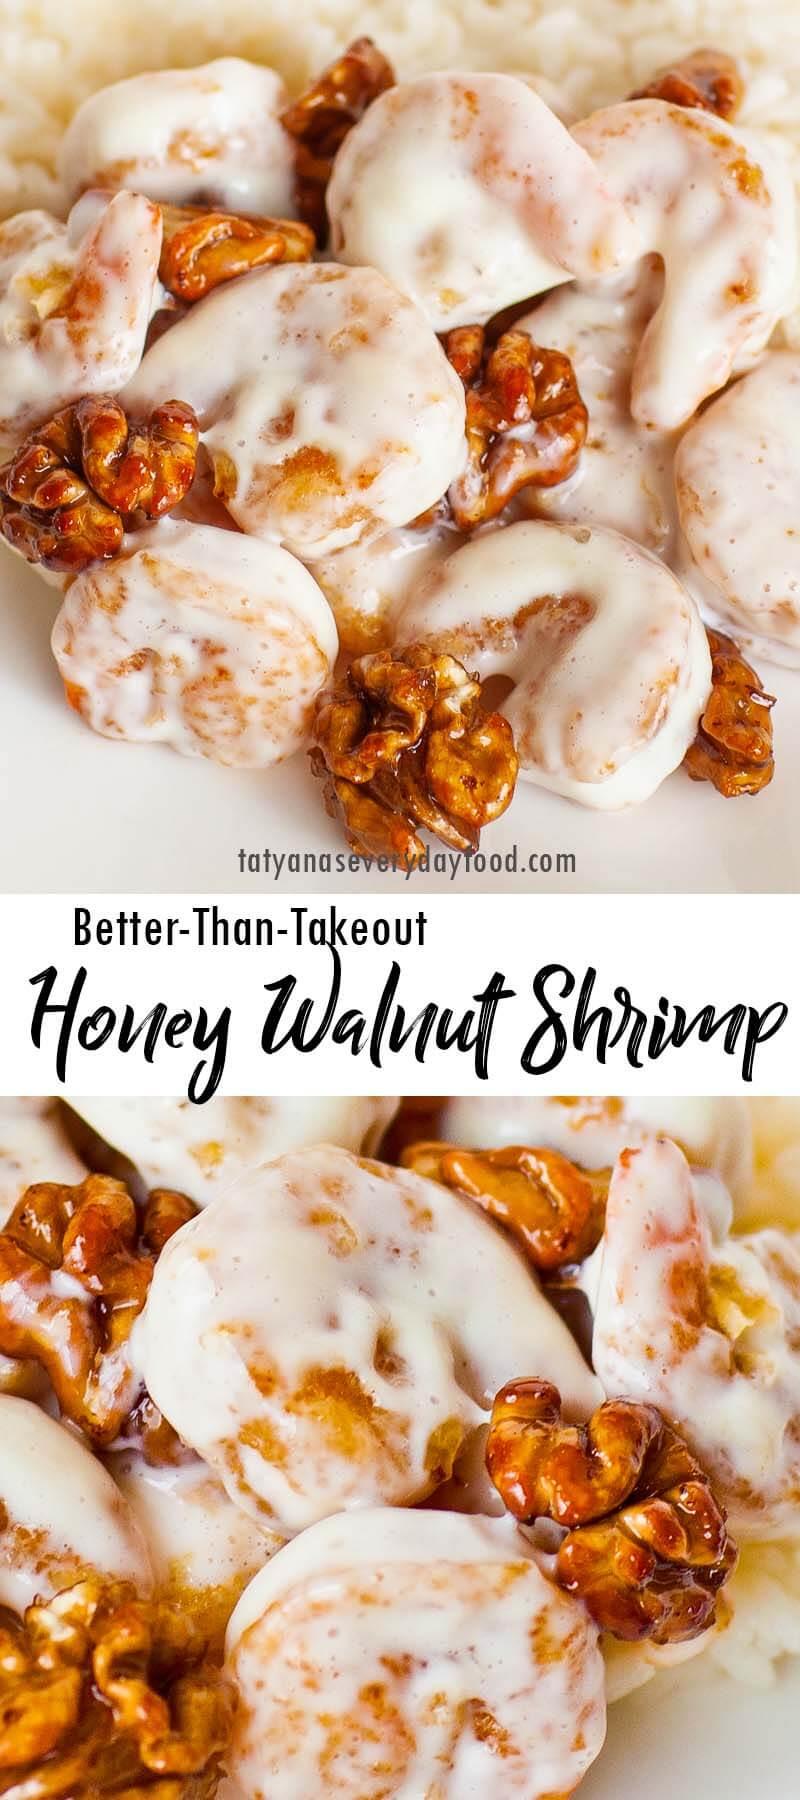 Honey Walnut Shrimp video recipe